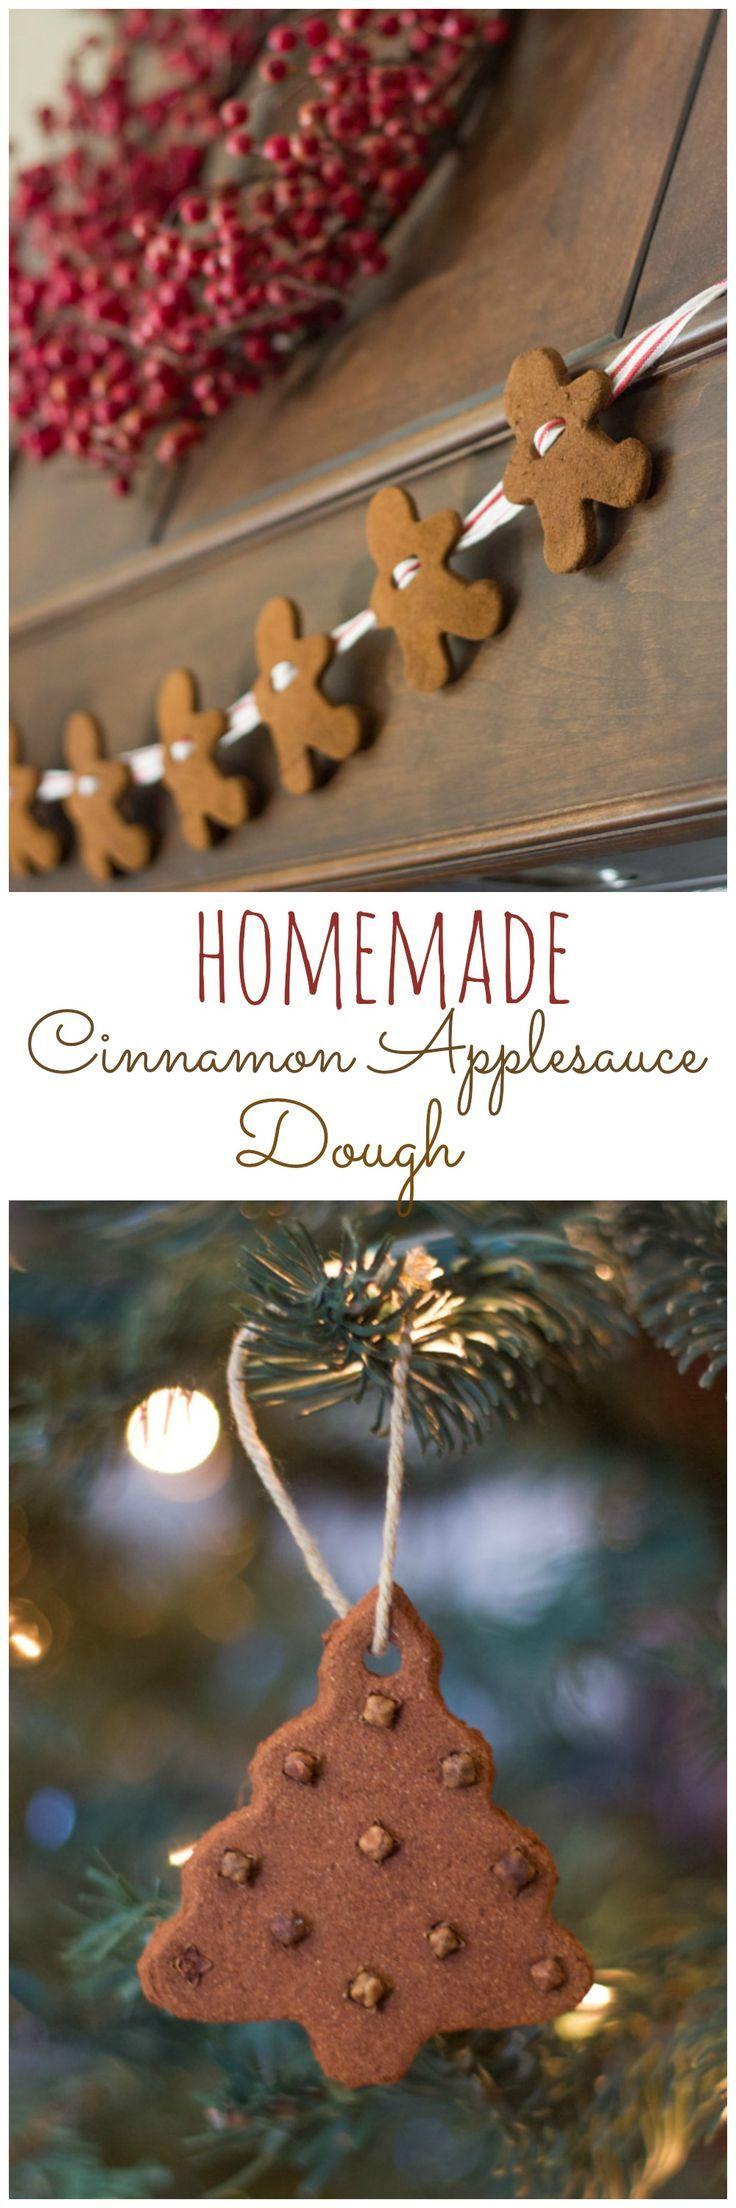 Cinnamon Applesauce Dough Lovely Little Kitchen Christmas Crafts Homemade Christmas Christmas Diy